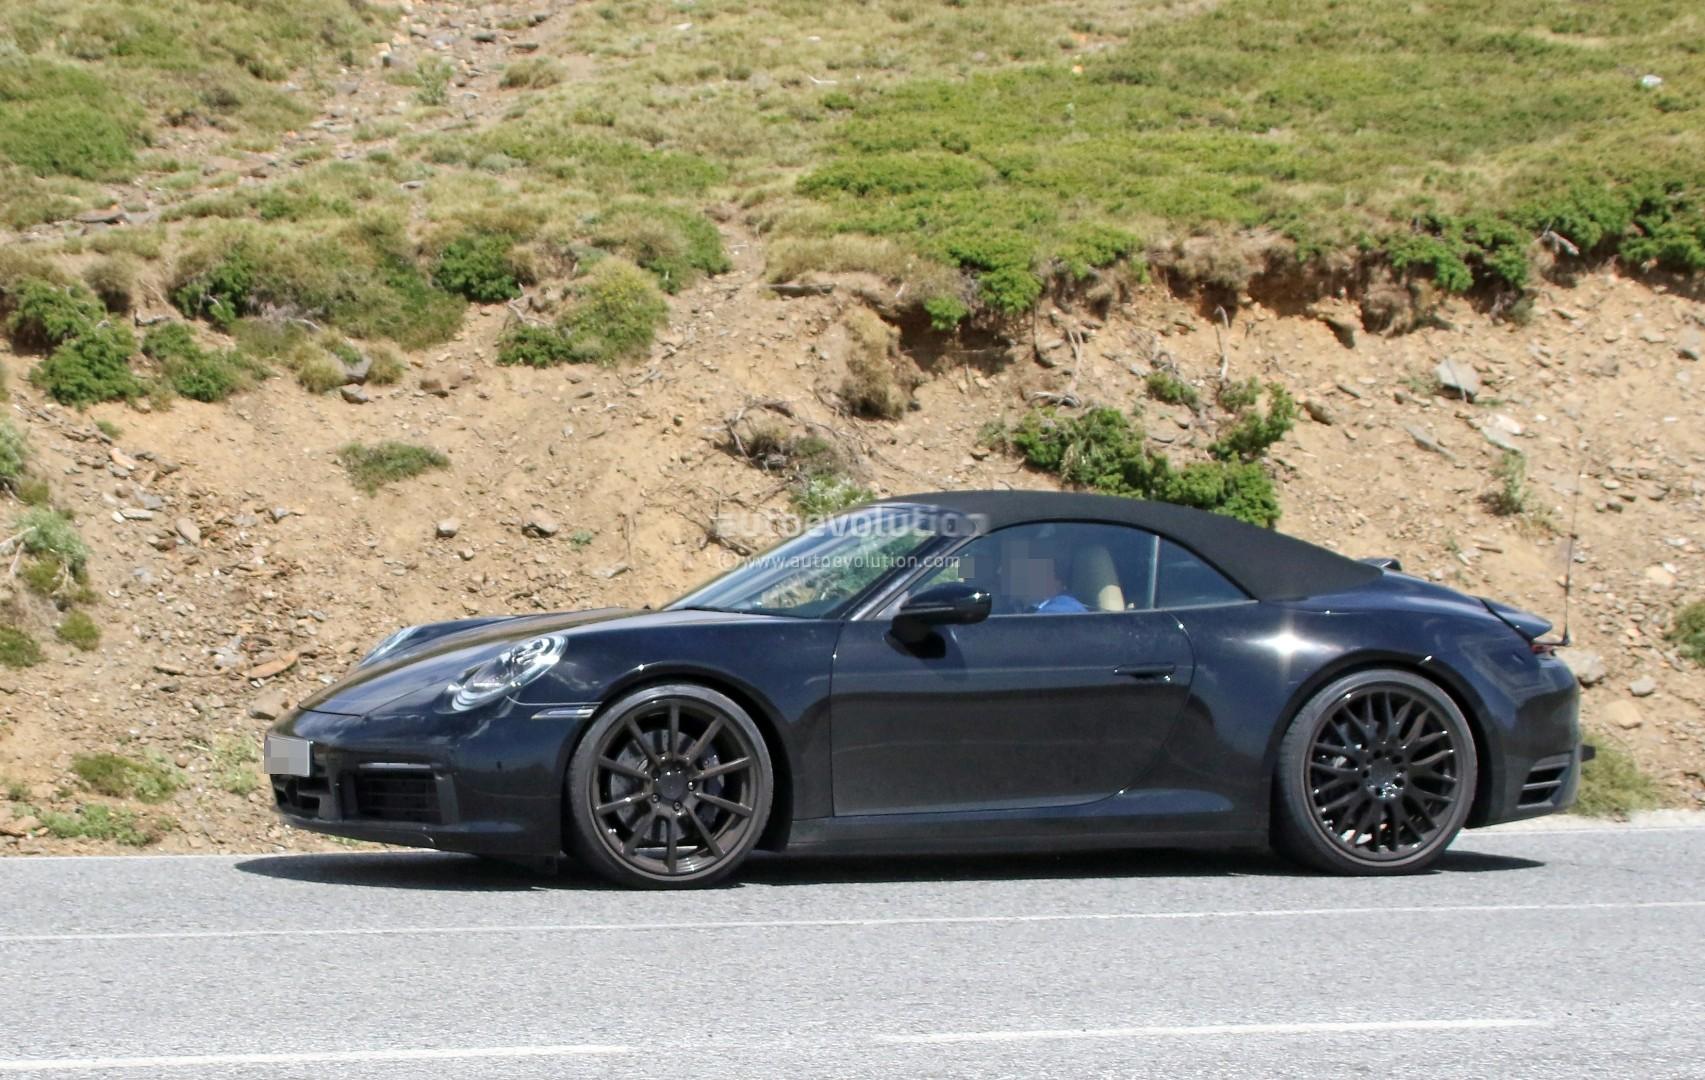 spyshots 2019 porsche 911 shows muffler design hints at new engine position autoevolution. Black Bedroom Furniture Sets. Home Design Ideas